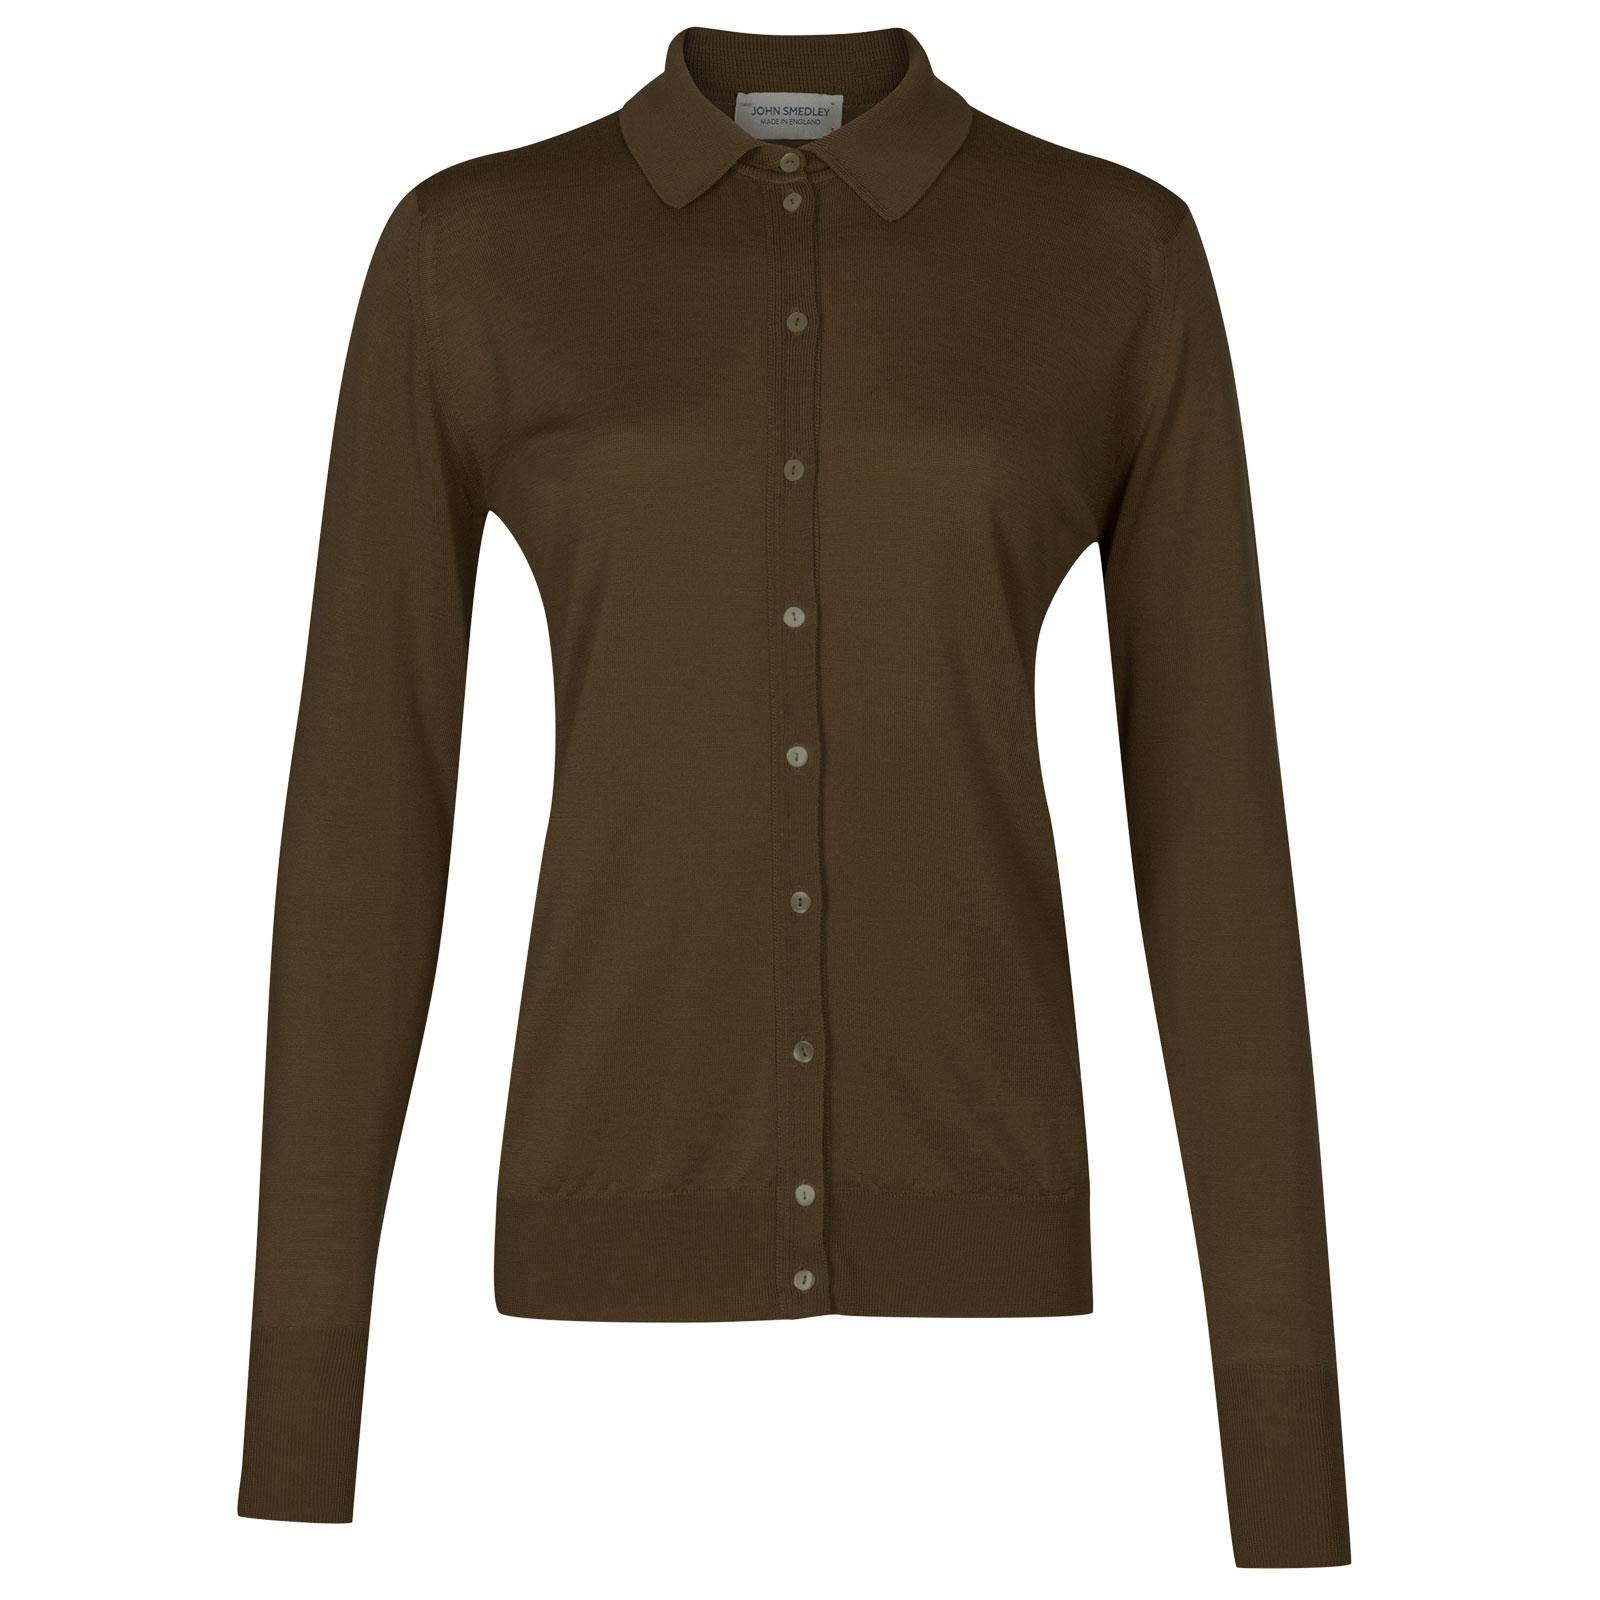 John Smedley bartley Merino Wool Shirt in Kielder Green-XL